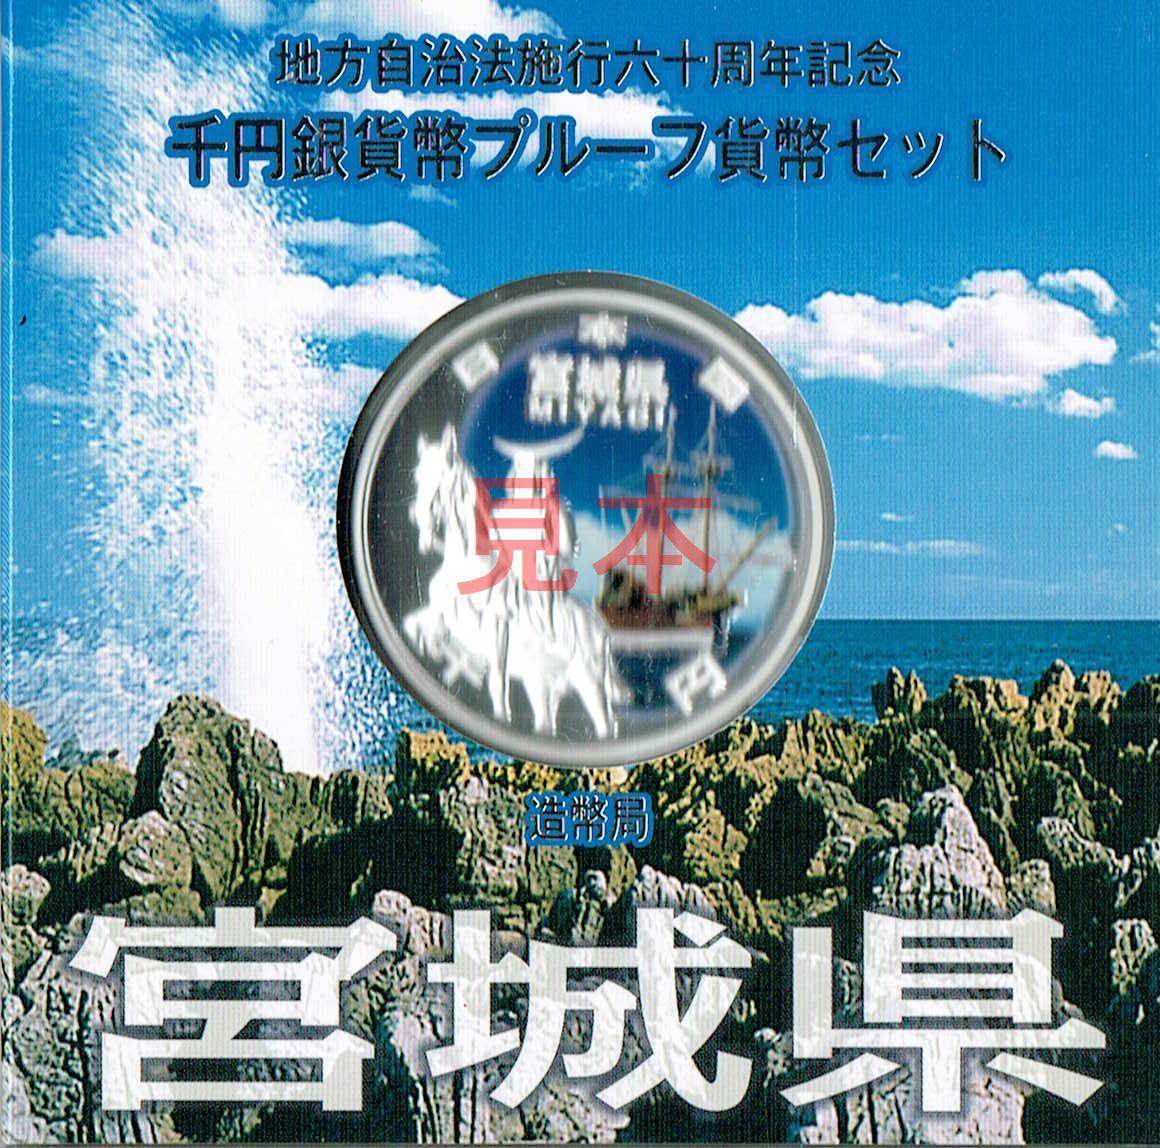 商品名「地方自治法施行60周年記念千円銀貨幣プルーフ Aセット 宮城県」